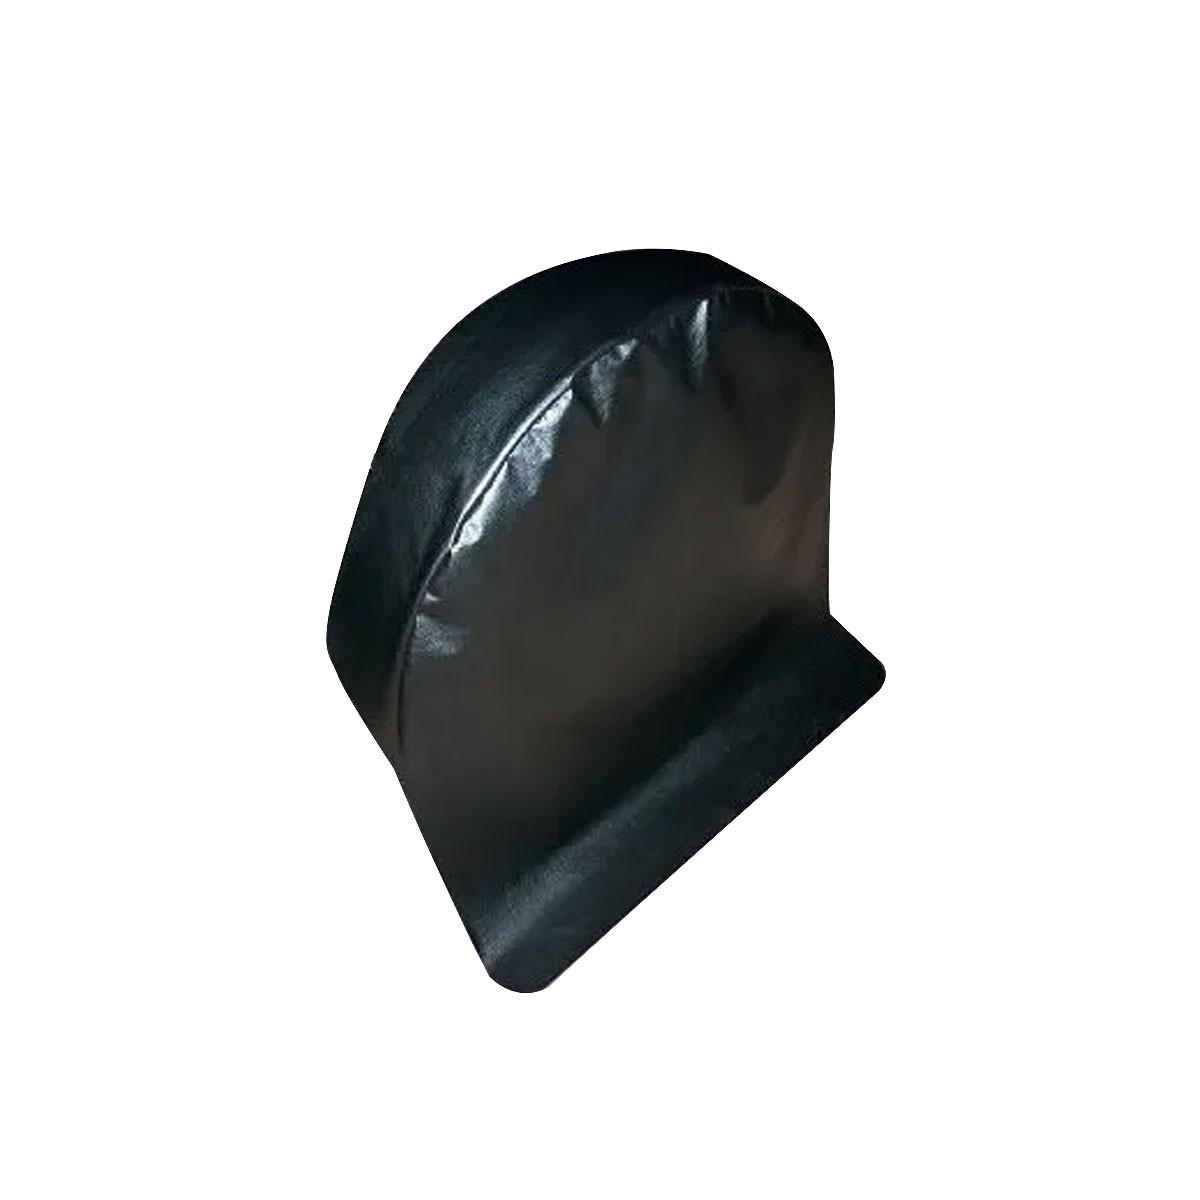 Kit Com 4 Capas Anti Xixi Para Roda - Aro 13 / 14 / 15